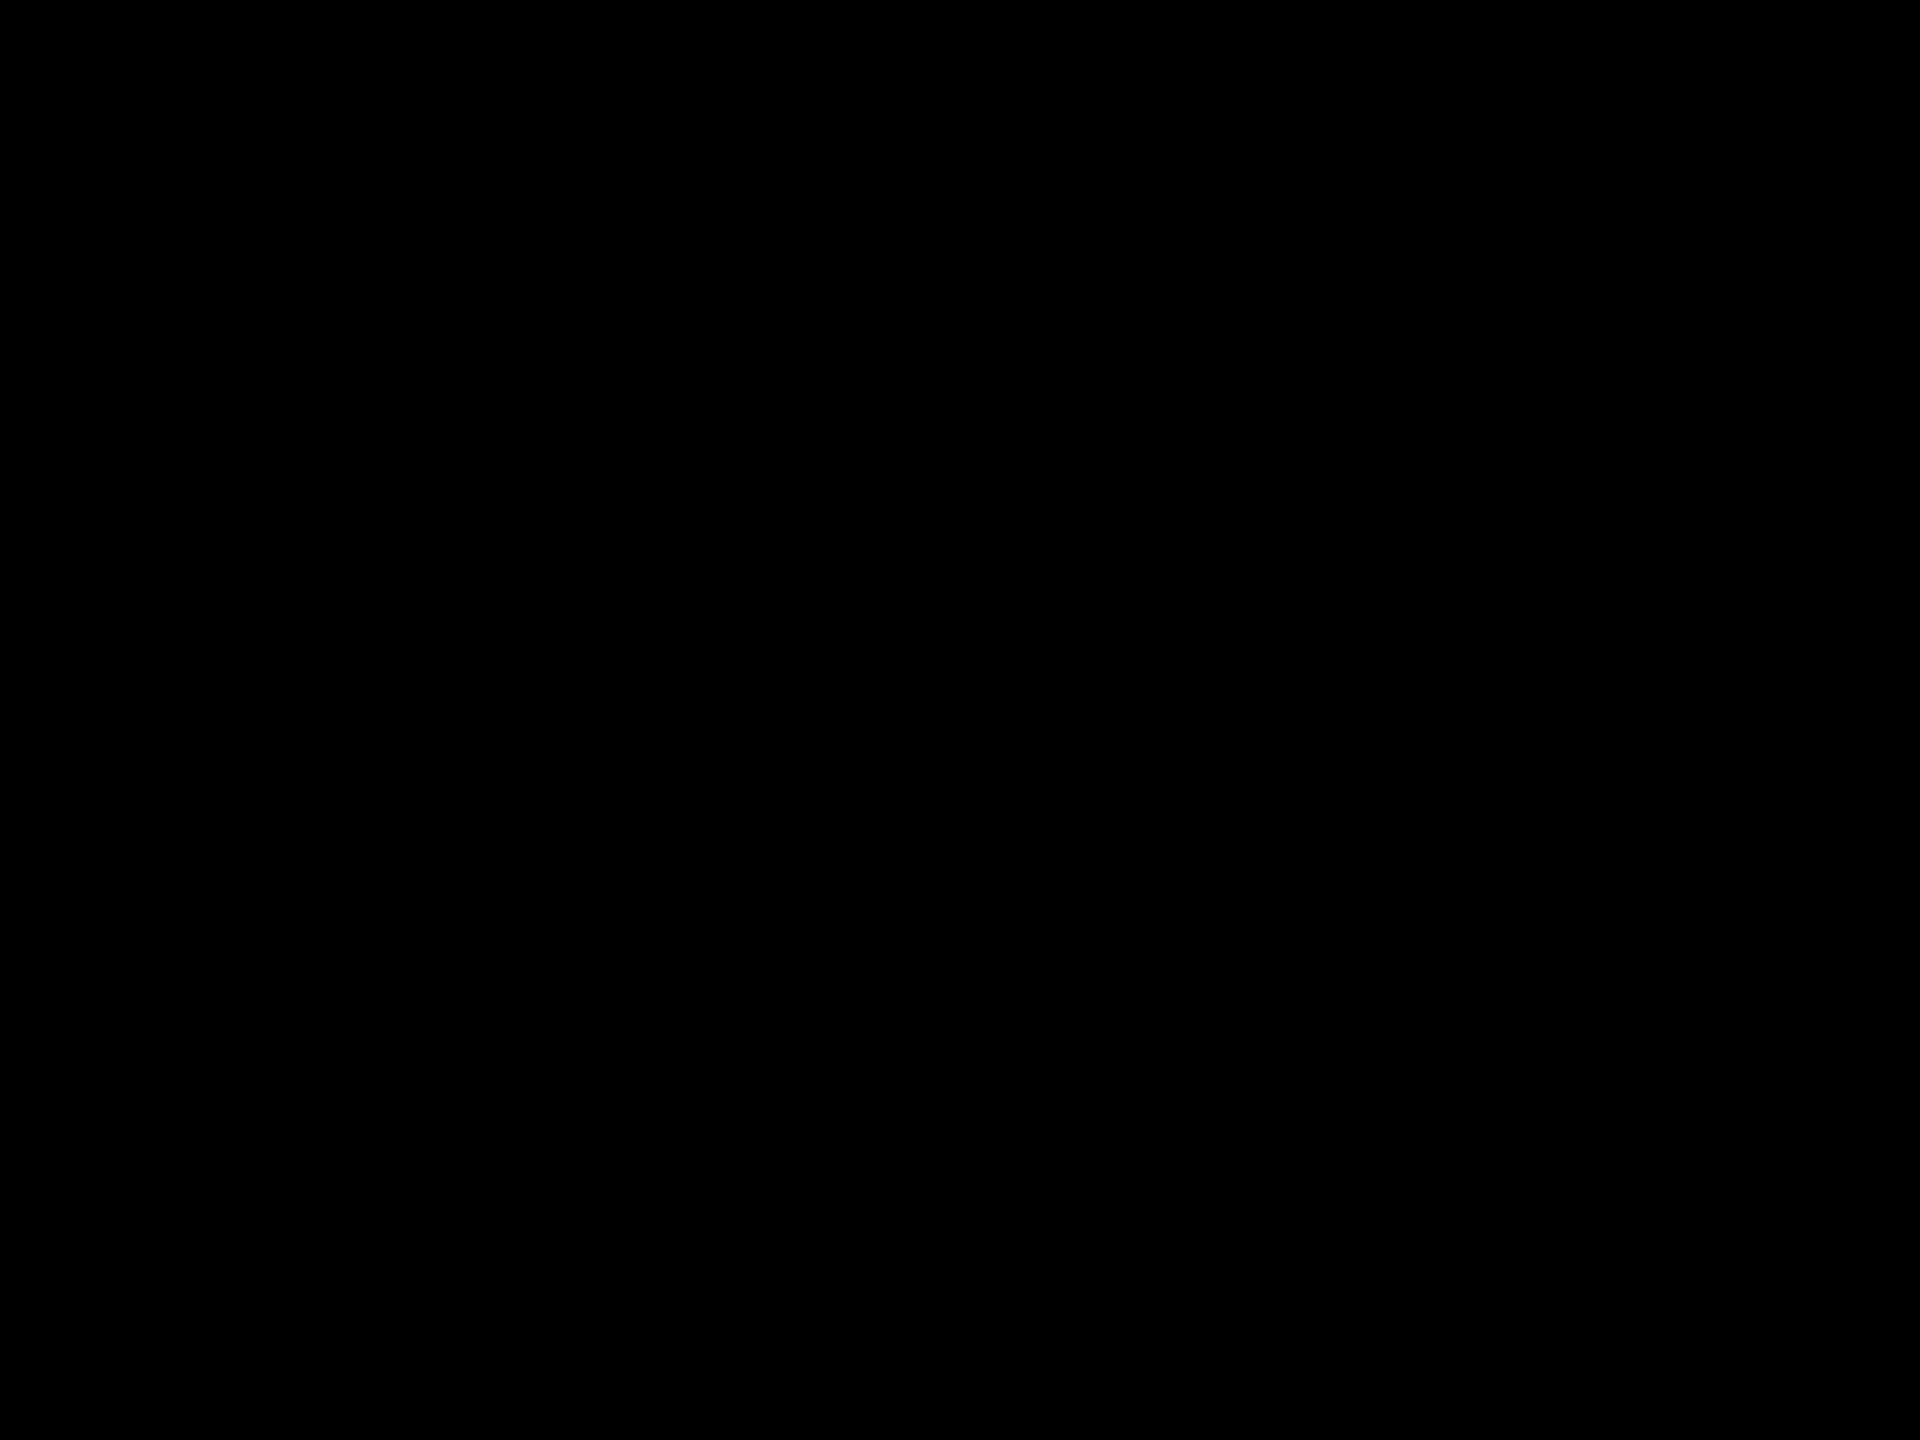 particlebg5.jpg